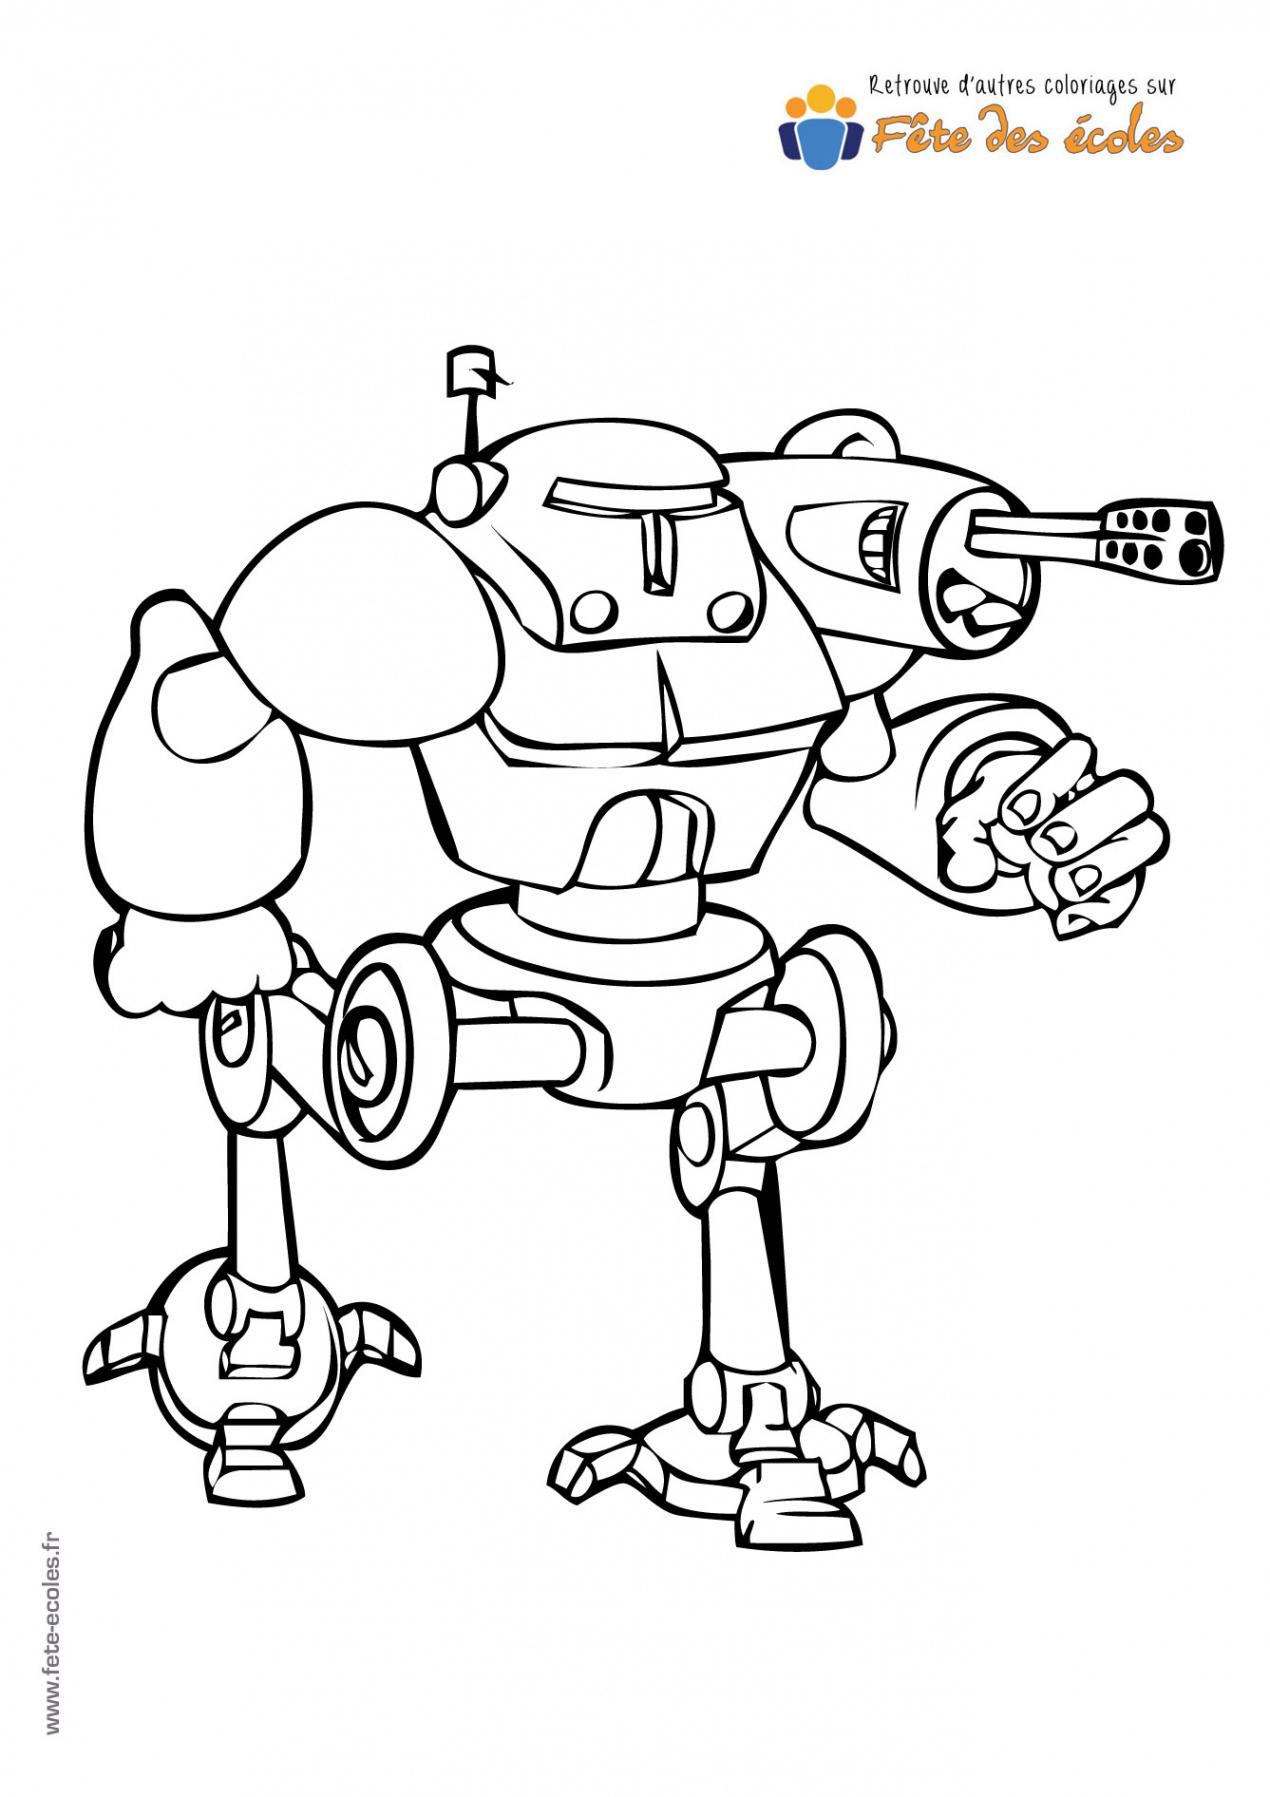 Hd Wallpapers Coloriage A Imprimer Robot Train 1920X1080 dedans Coloriage Robot À Imprimer